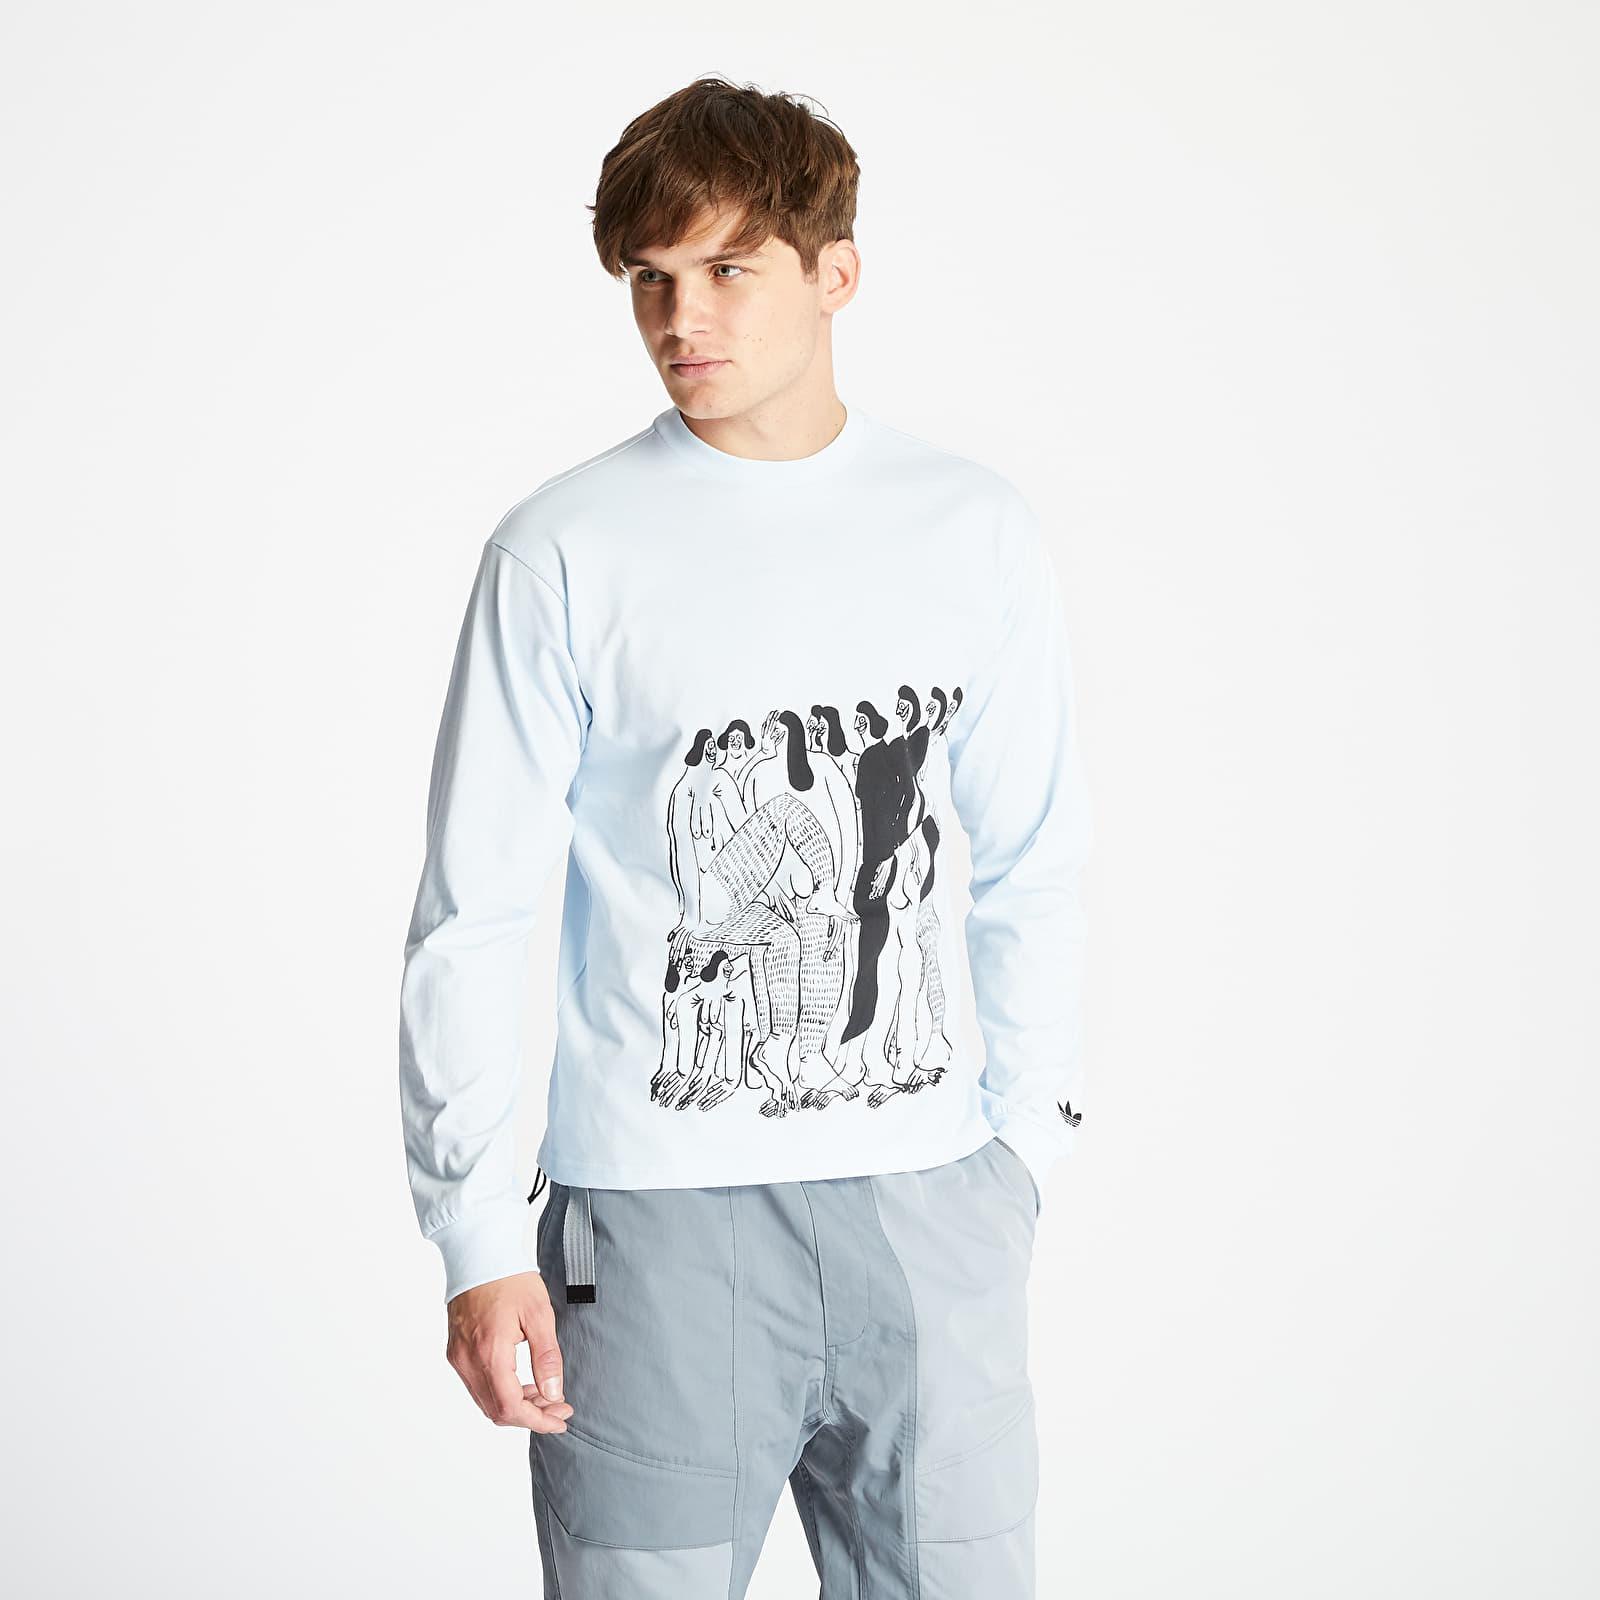 T-shirts adidas x Unity LS TEE Sky Tint/ Black